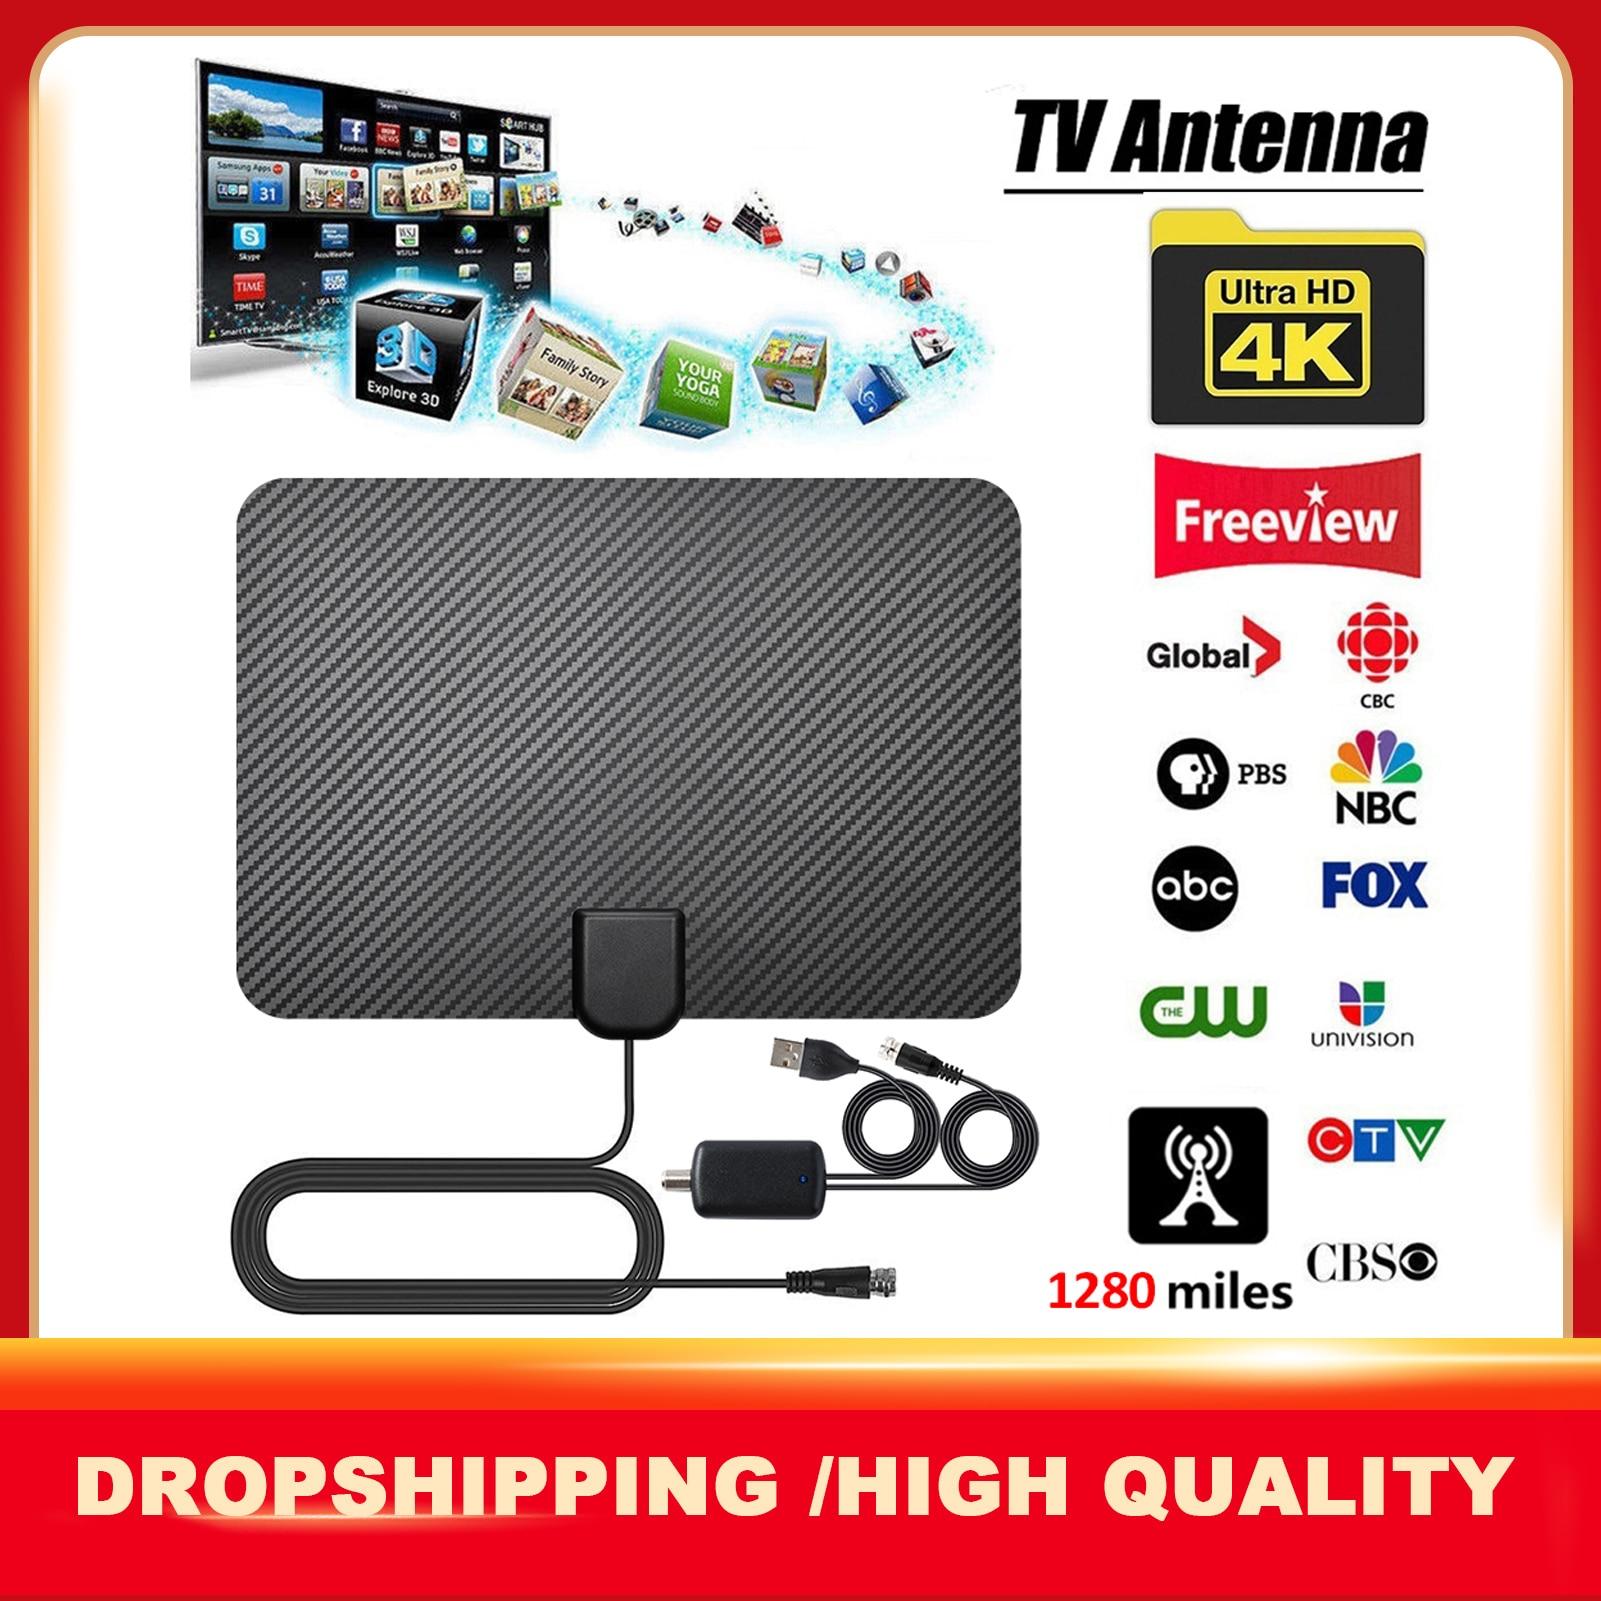 4K цифровое HDTV антенна для помещений усиленная антенна диапазон 1280 миль FM /VHF/UHF прием Full HD TV HD цифровая ТВ антенна телевиы